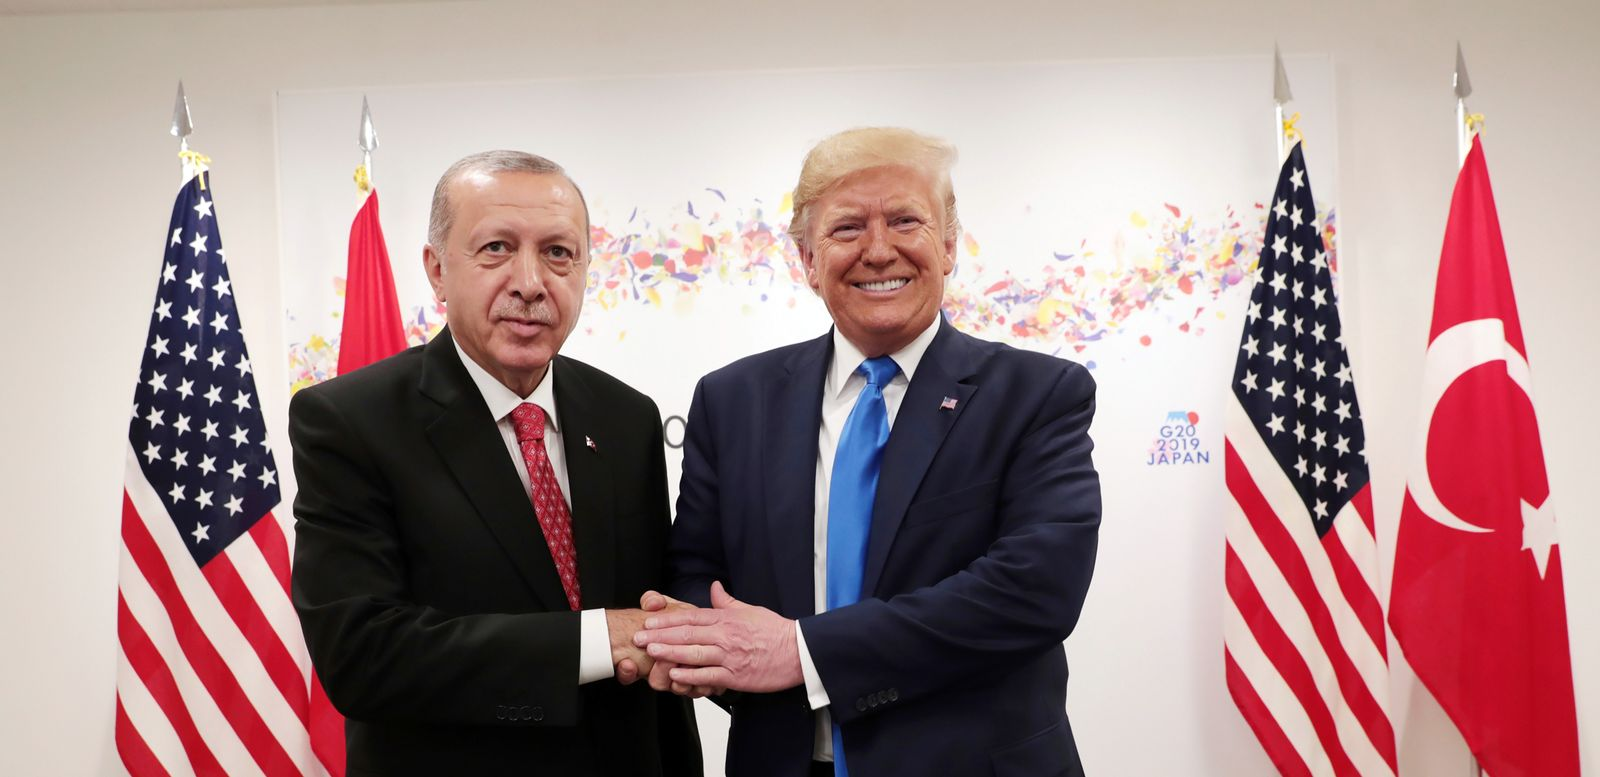 Recep Tayyip Erdogan / Donald Trump